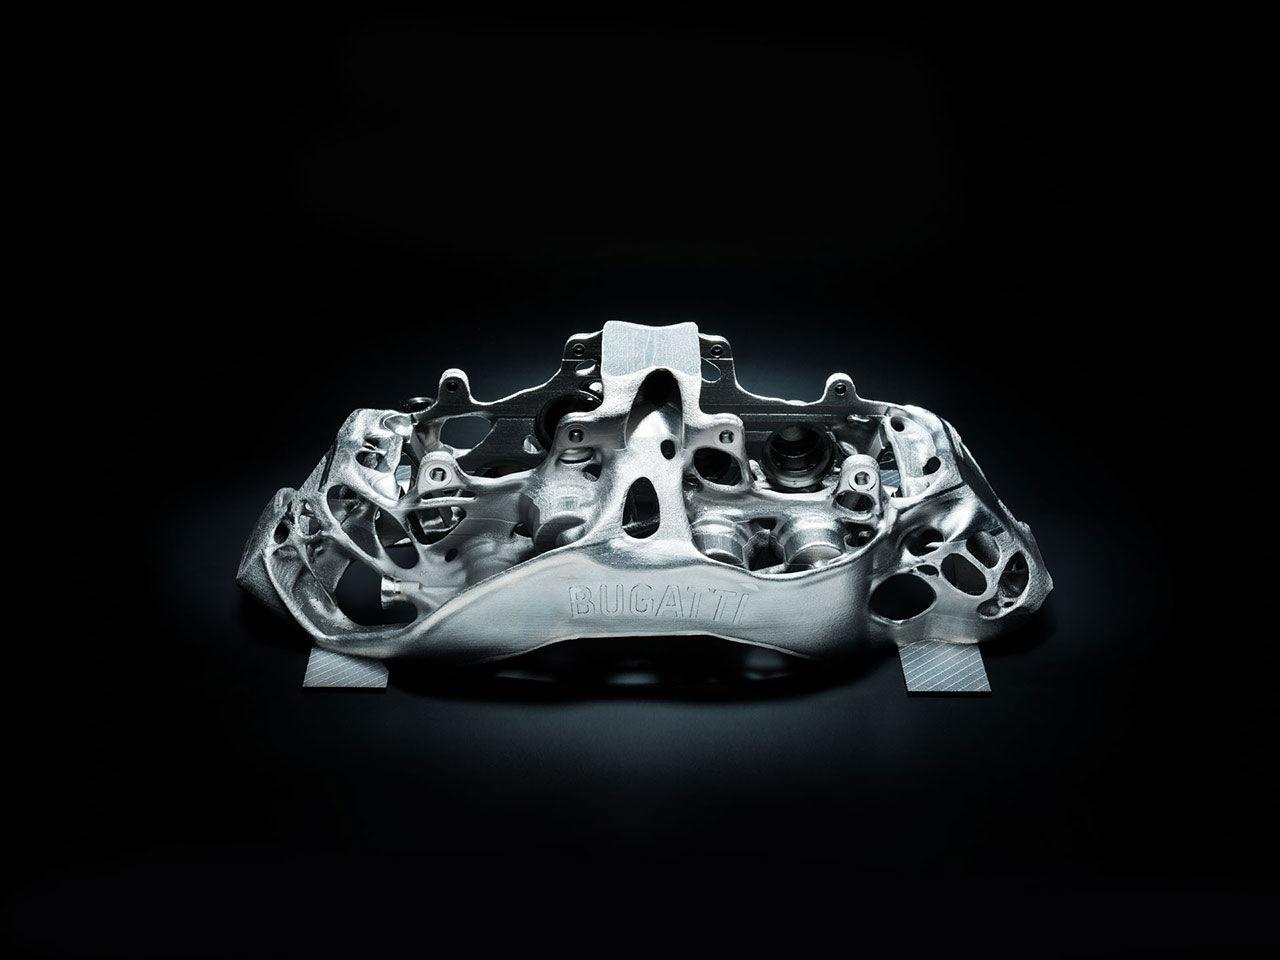 Bugatti har skrivit ut ett bromsok